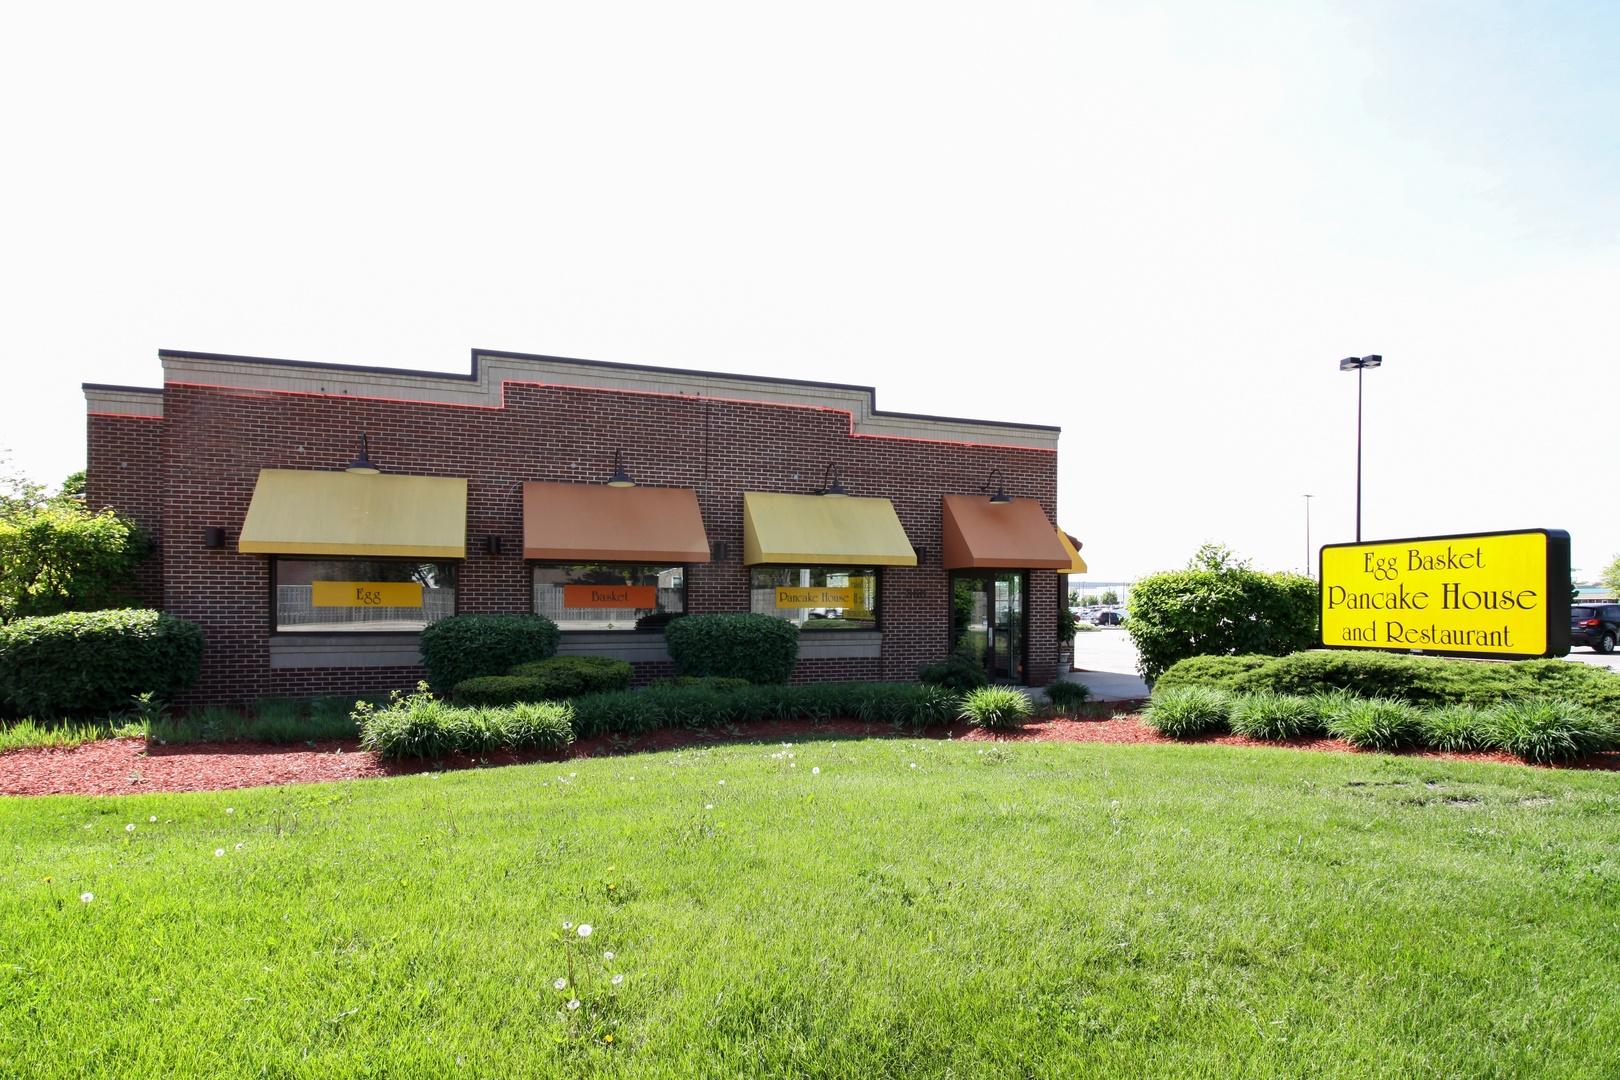 999 Confidential, Streamwood, Illinois 60107